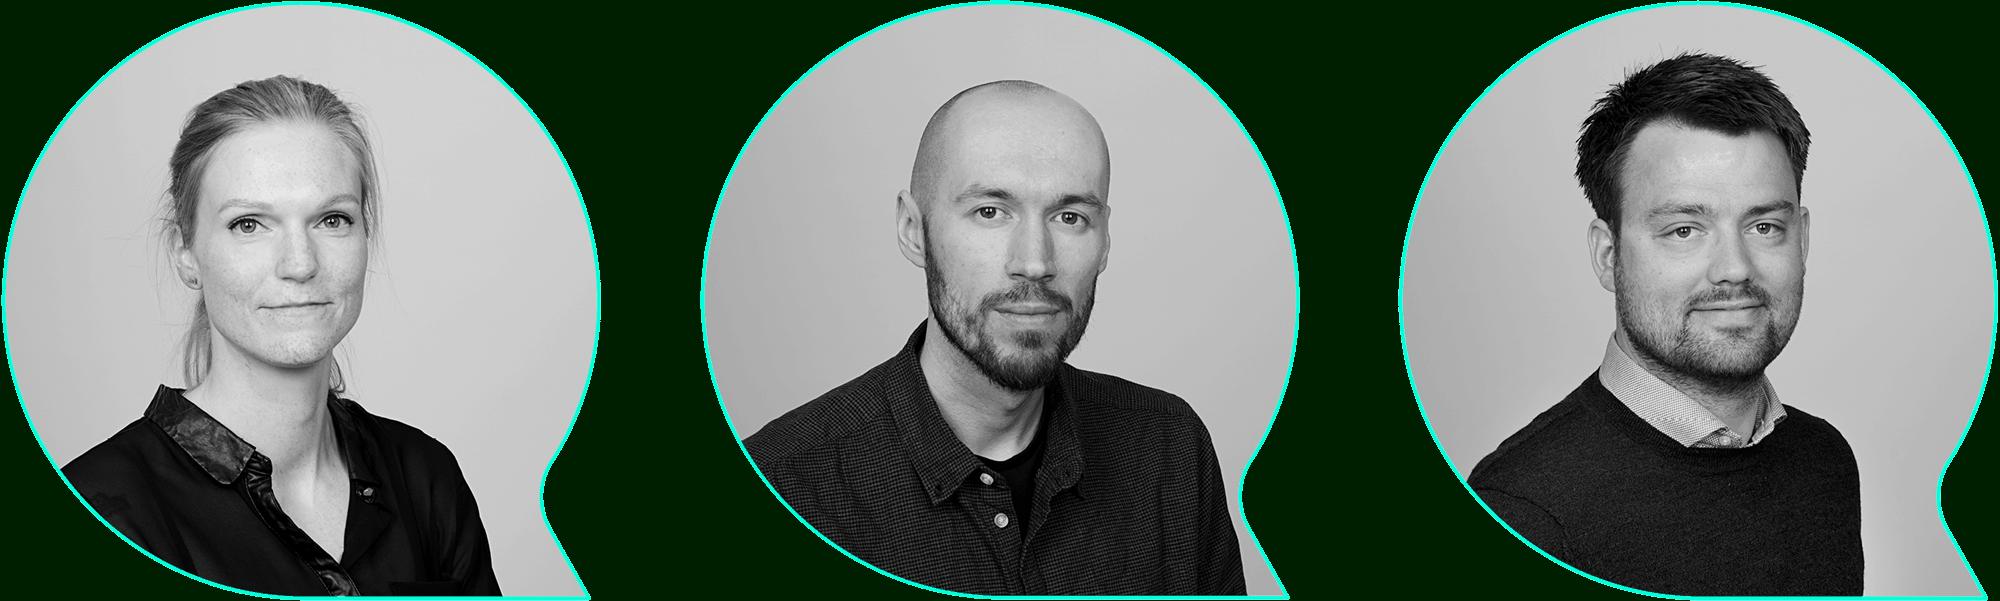 Elin S. Tystad | Ben Ormstad | Simen V. Thorsrud